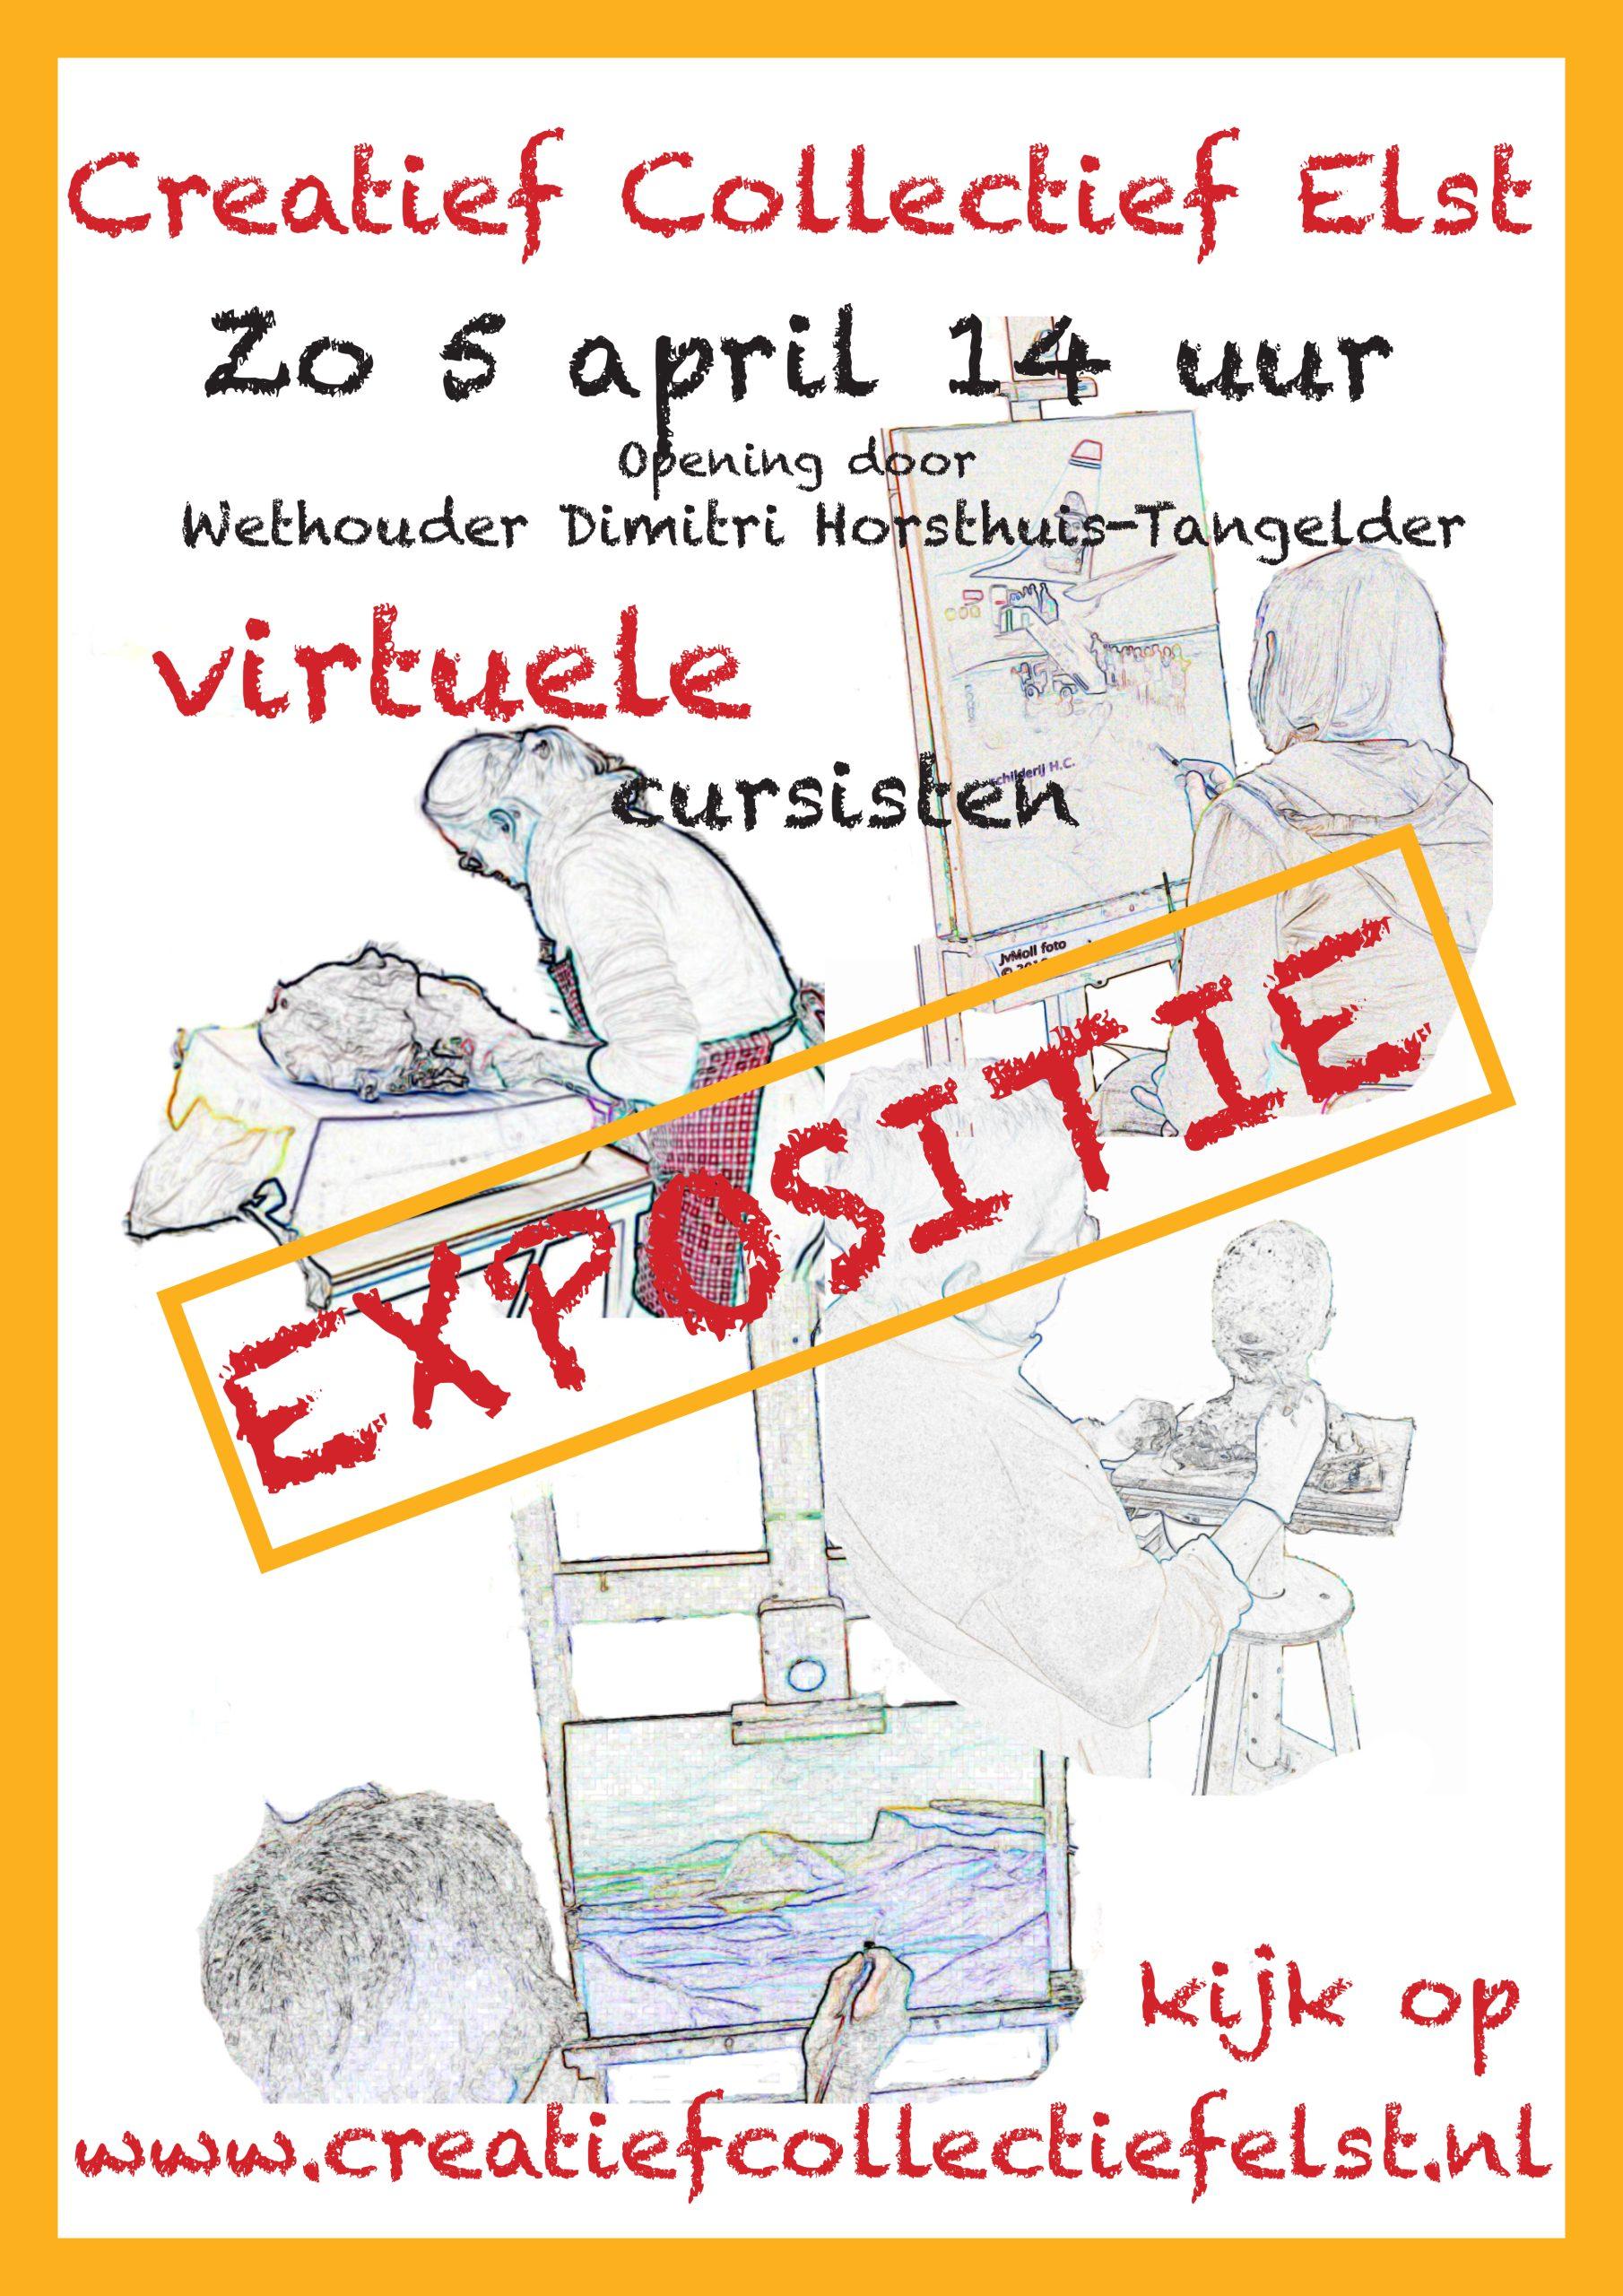 Affiche Viruuele cursisten expositie 2020